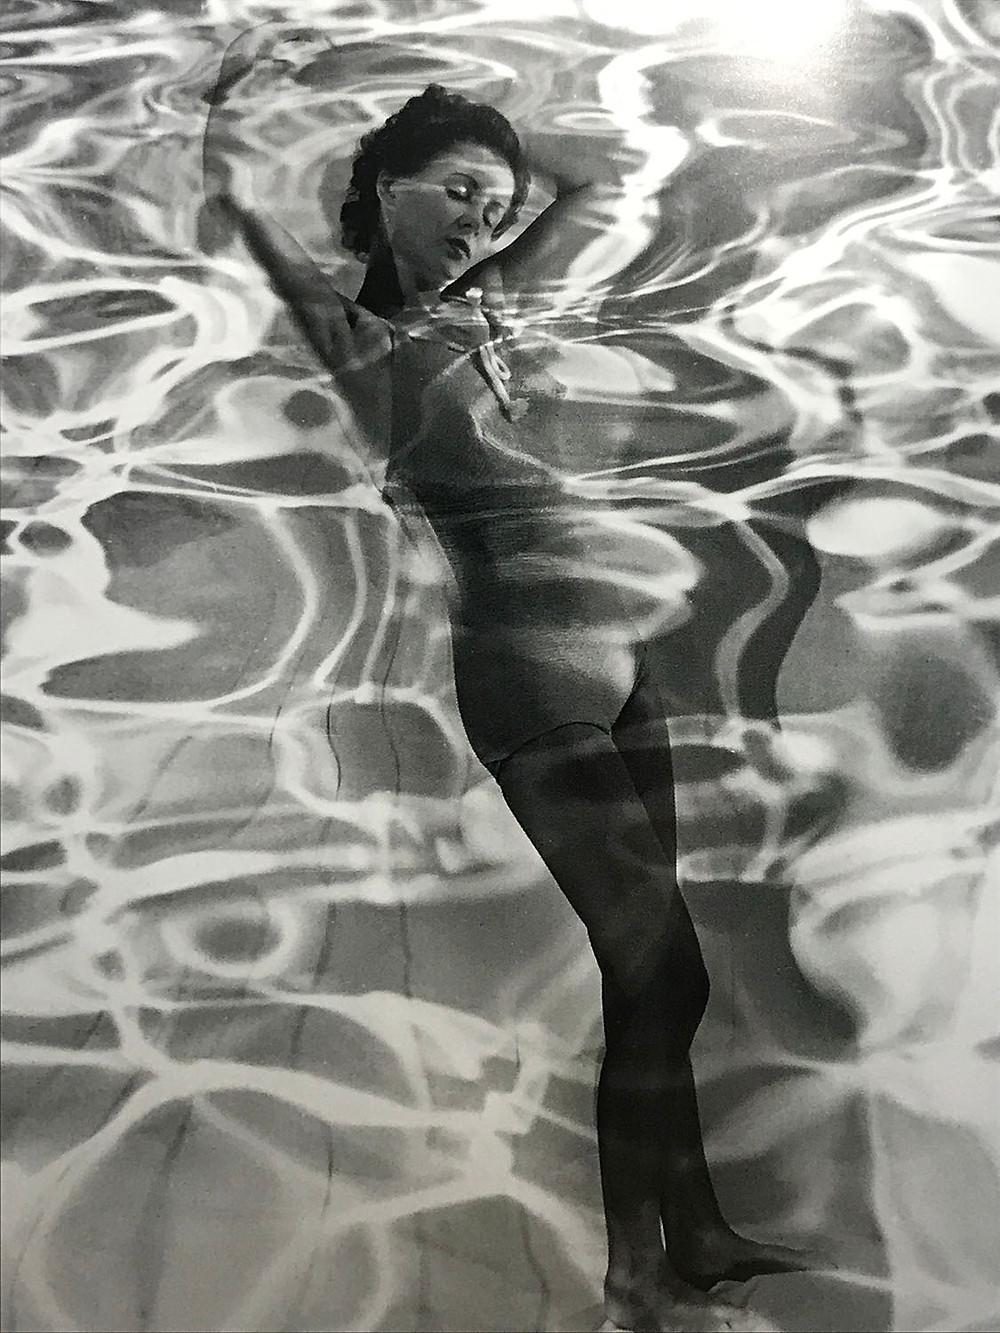 Bagnante (1931-1936, fotoimpressione) Dora Maar